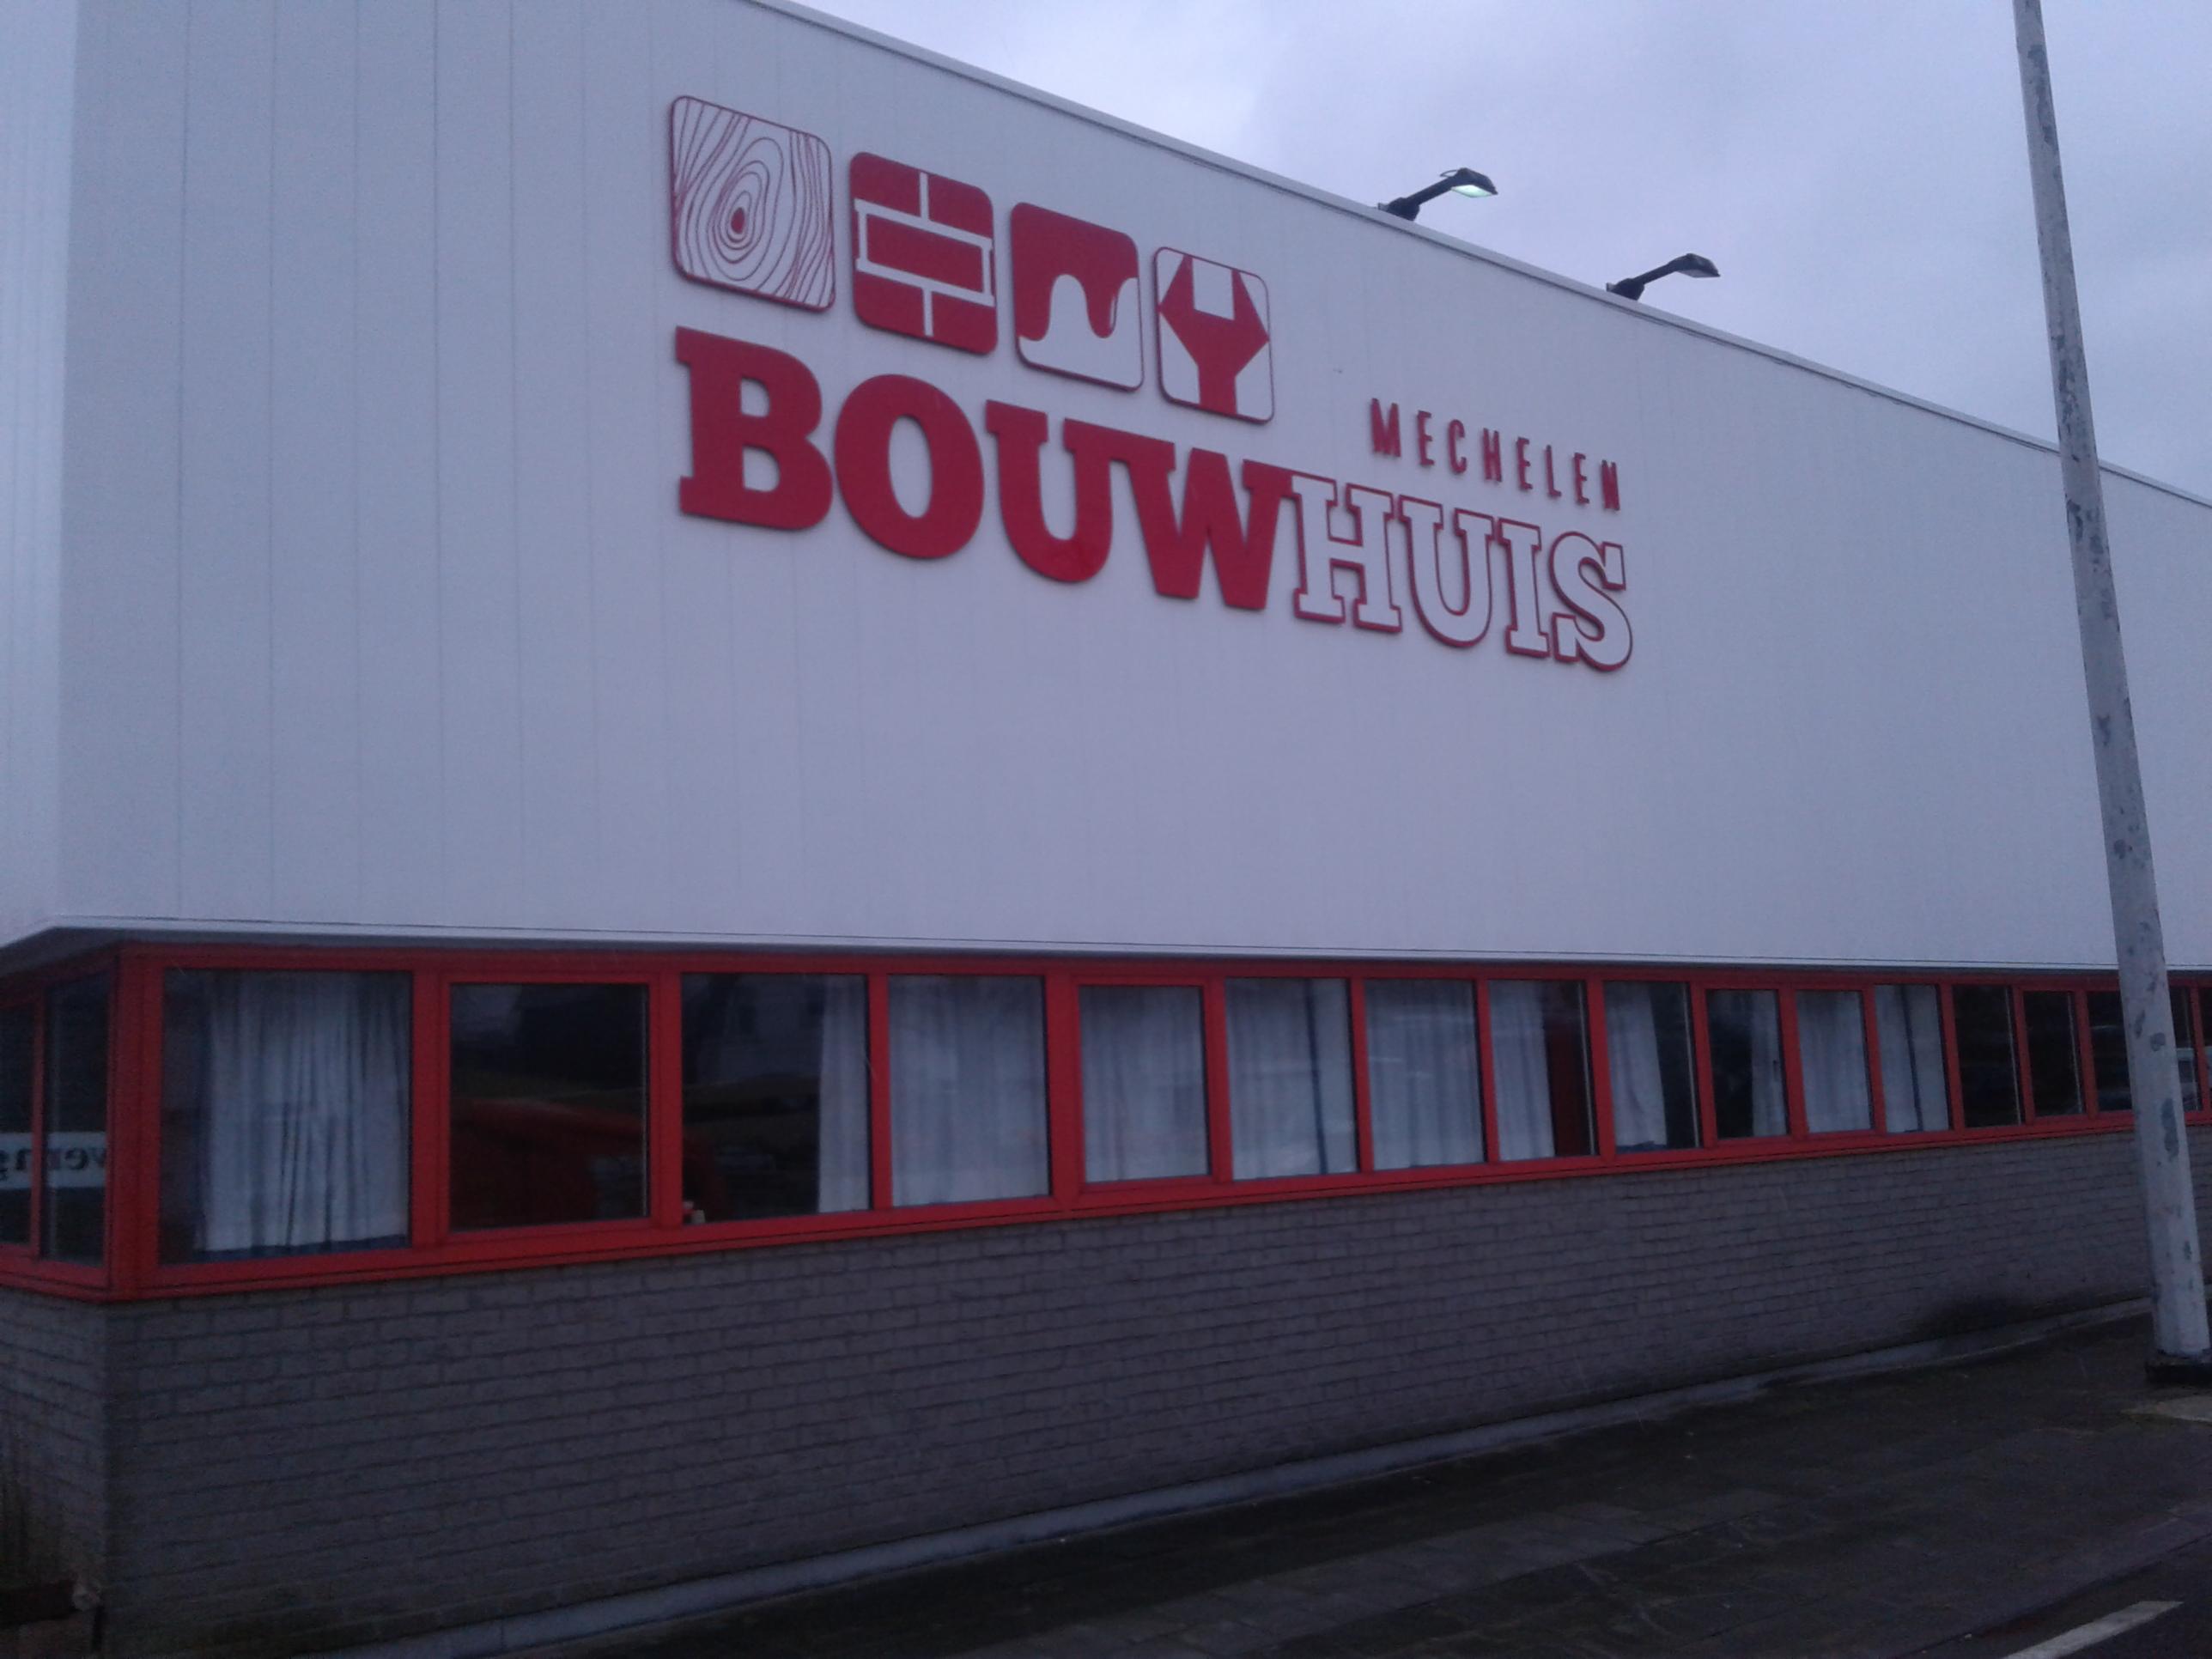 Gevelletters_BouwhuisMechelen